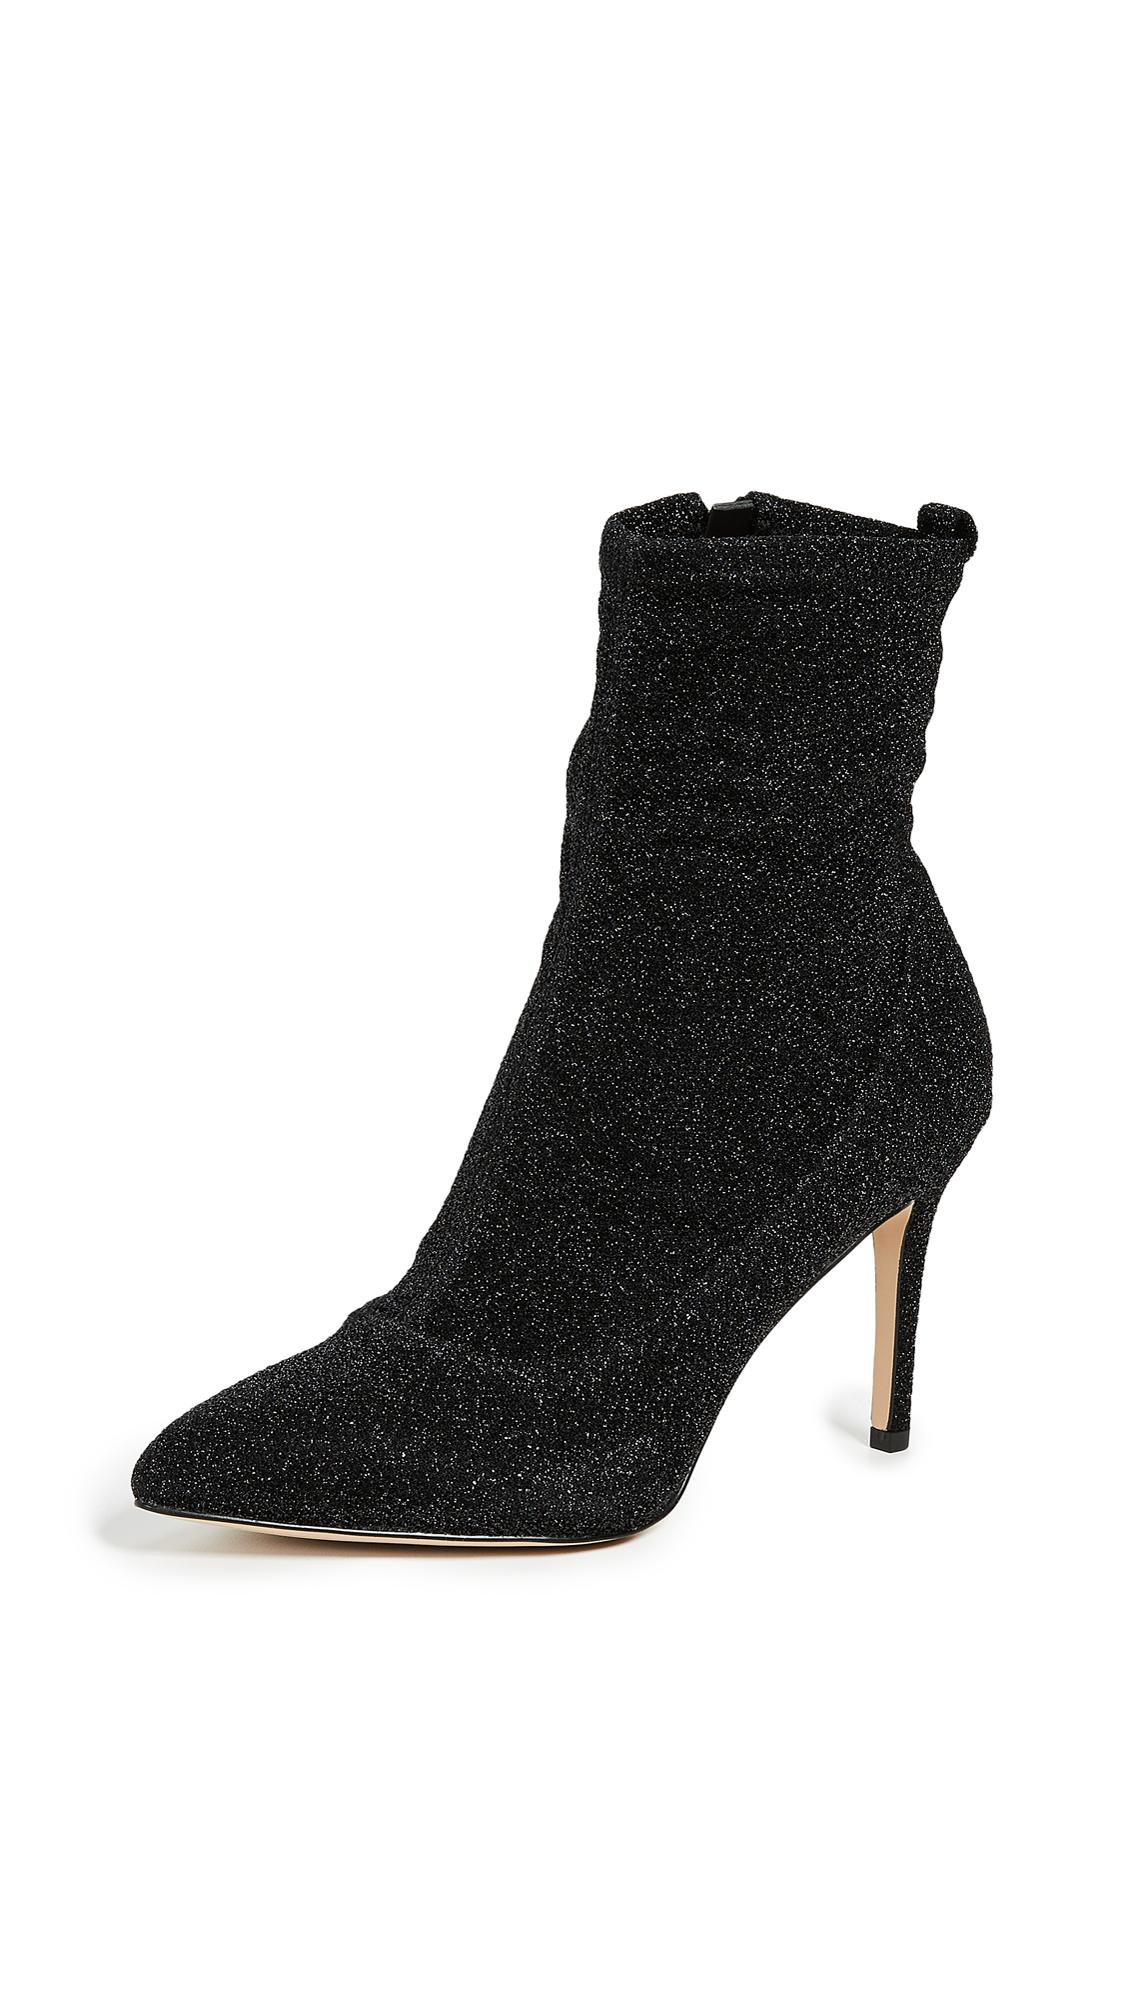 Sam Edelman Olson Boots - Black